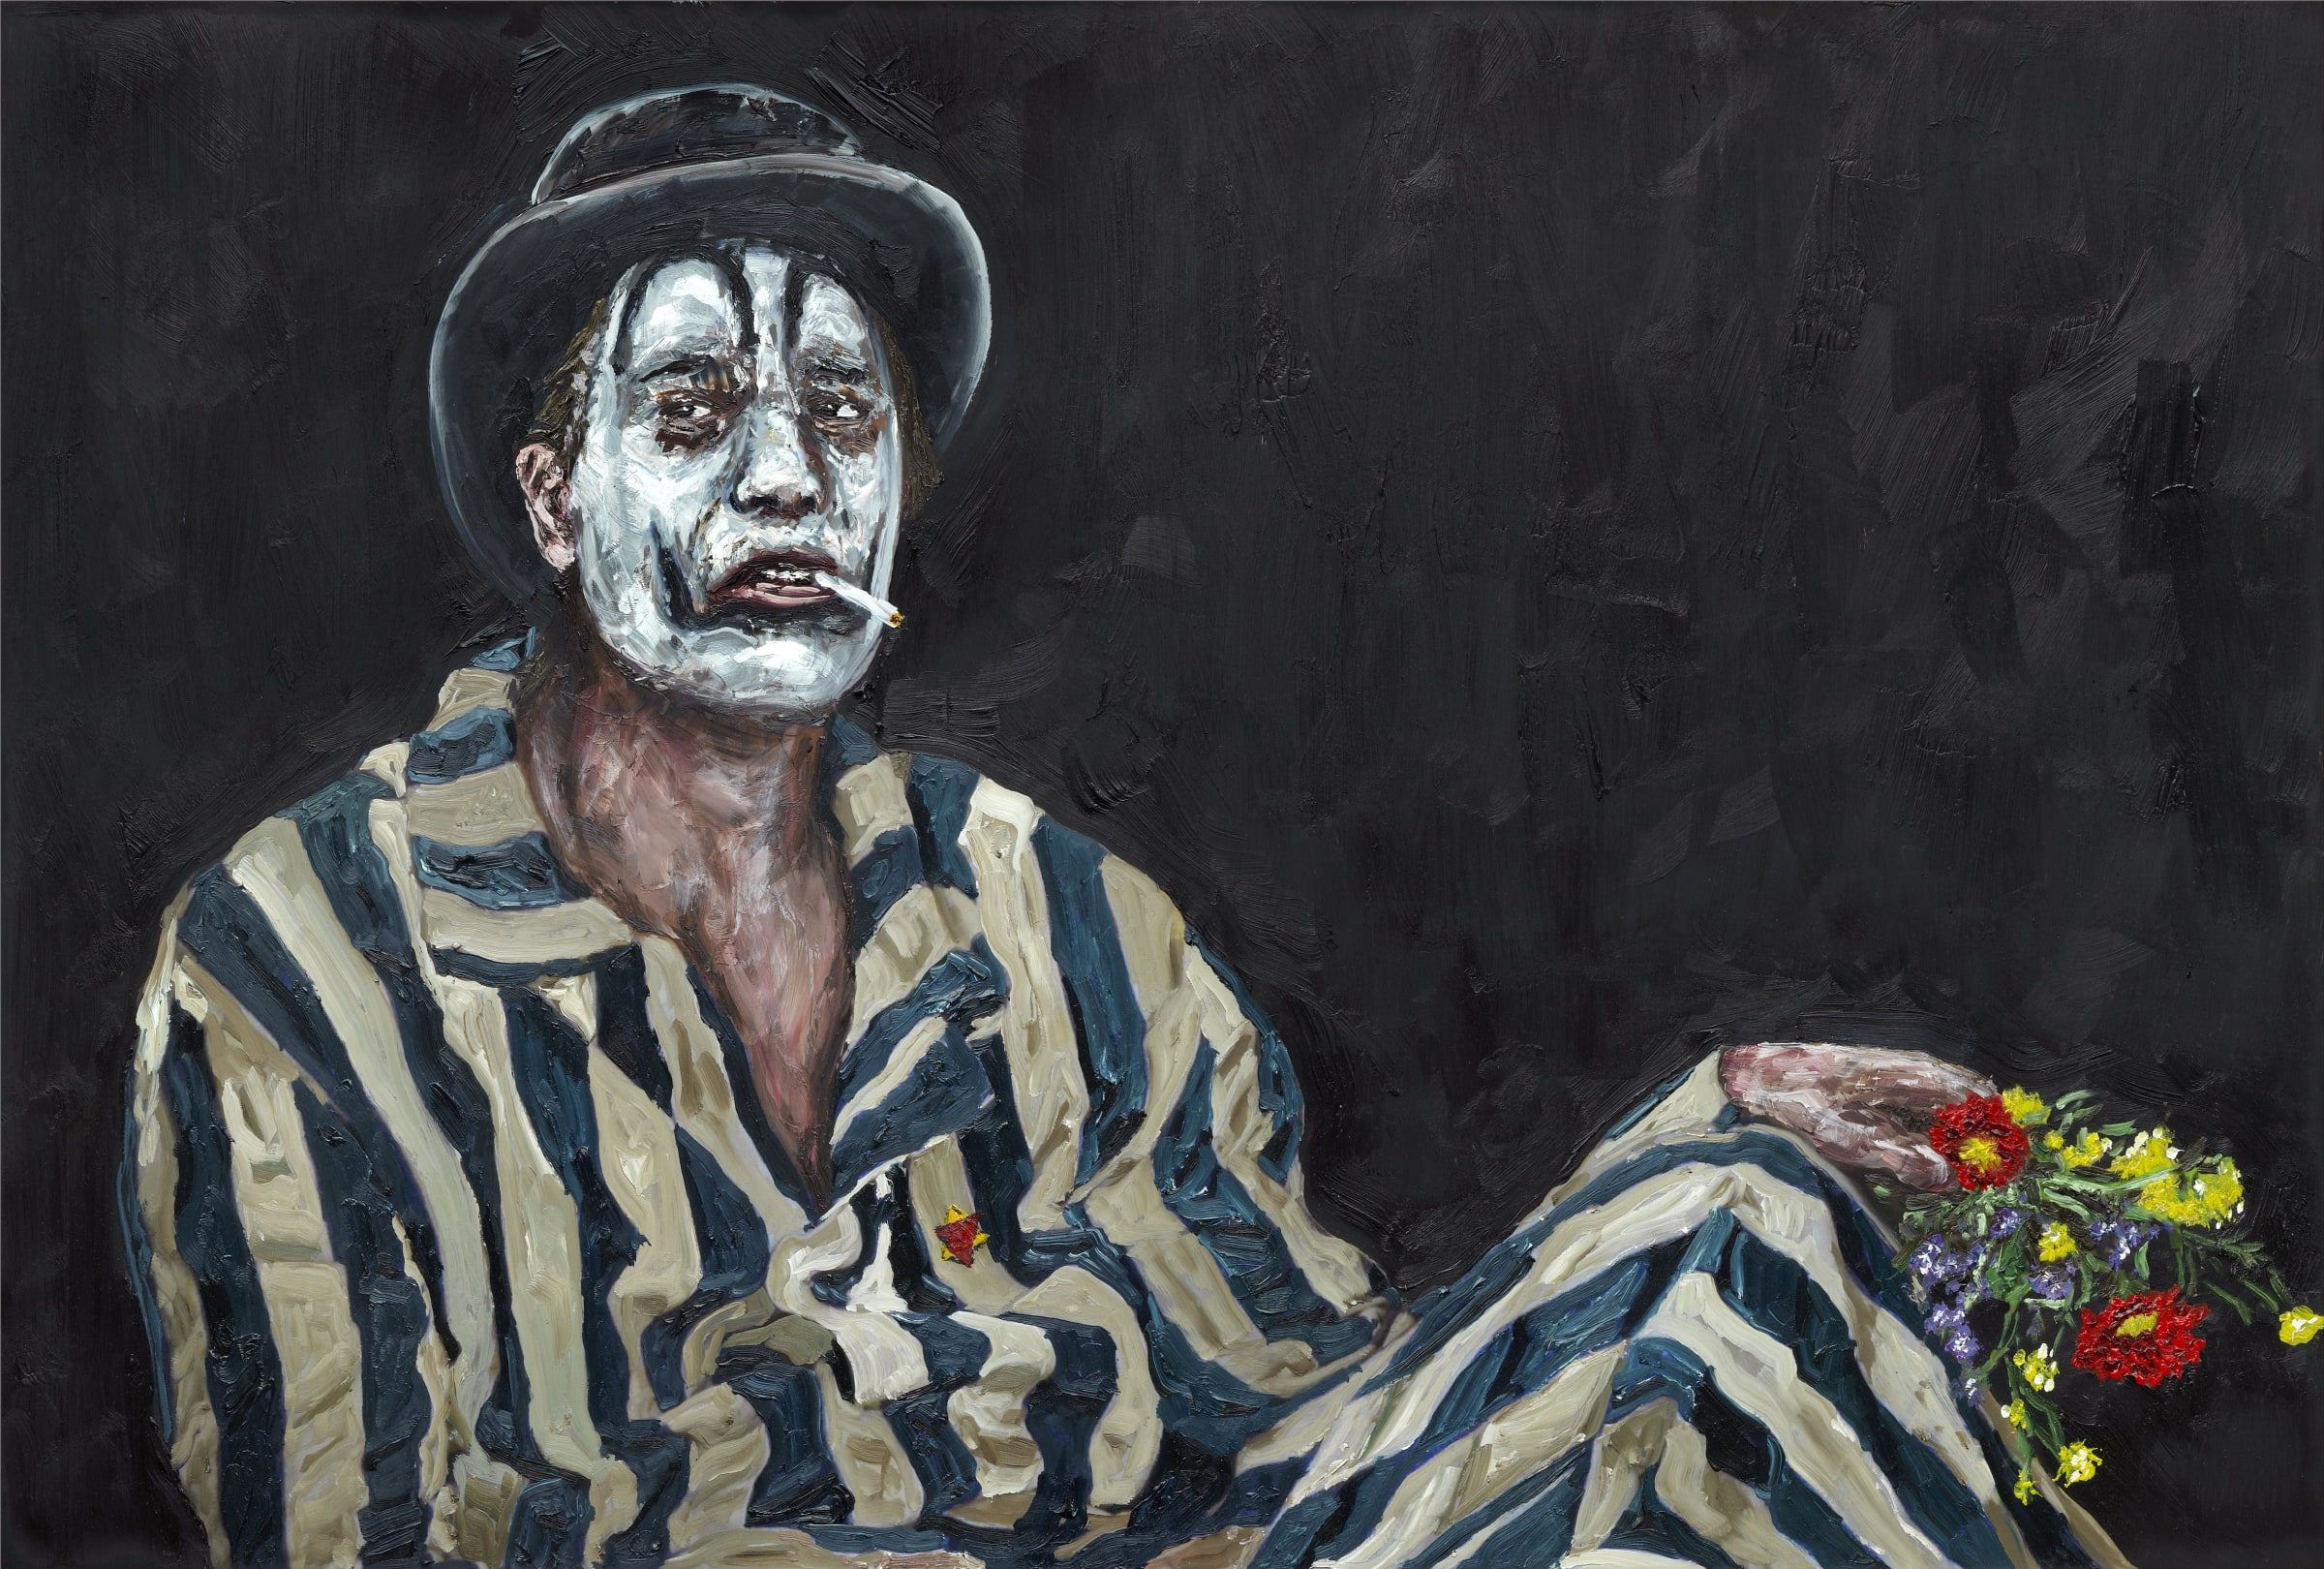 "<span class=""link fancybox-details-link""><a href=""/artists/56-ronald-ophuis/works/8354/"">View Detail Page</a></span><div class=""artist""><strong>Ronald OPHUIS</strong></div> <div class=""title""><em>Teatro la Tregua, Poland July 1945</em>, 2015</div> <div class=""medium"">Oil on canvas</div> <div class=""dimensions"">45 x 60 cm<br /> 17 3/4 x 23 5/8 in</div><div class=""copyright_line"">Copyright the artist</div>"